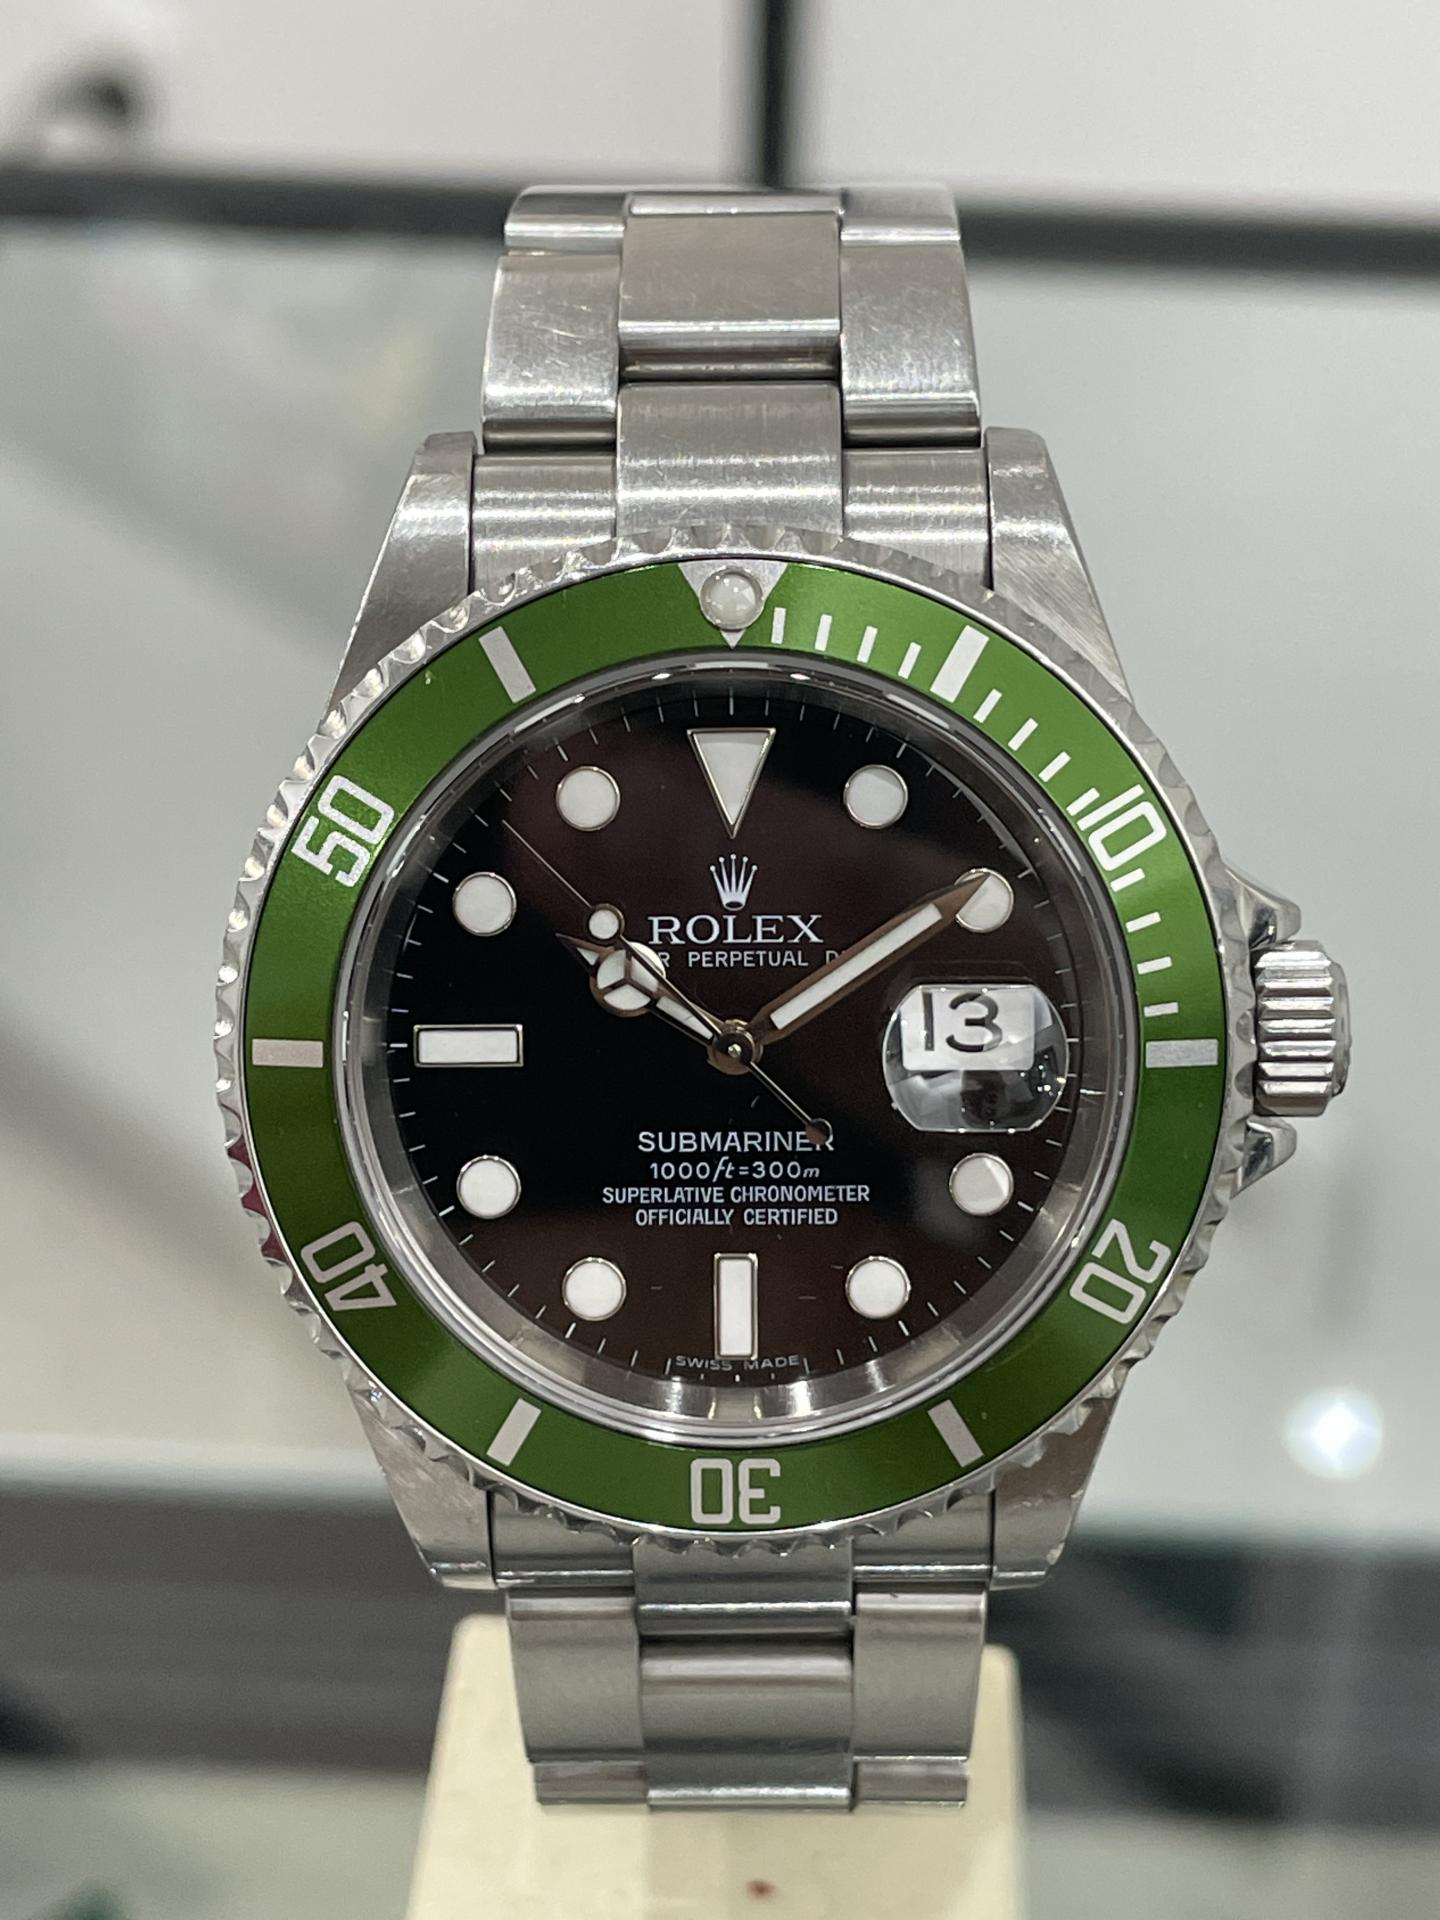 "Rolex Submariner LV ""Kermit"", Z series, NOT engraved, paper warranty Kermit Ref 16610Lv serial Z año 2006."